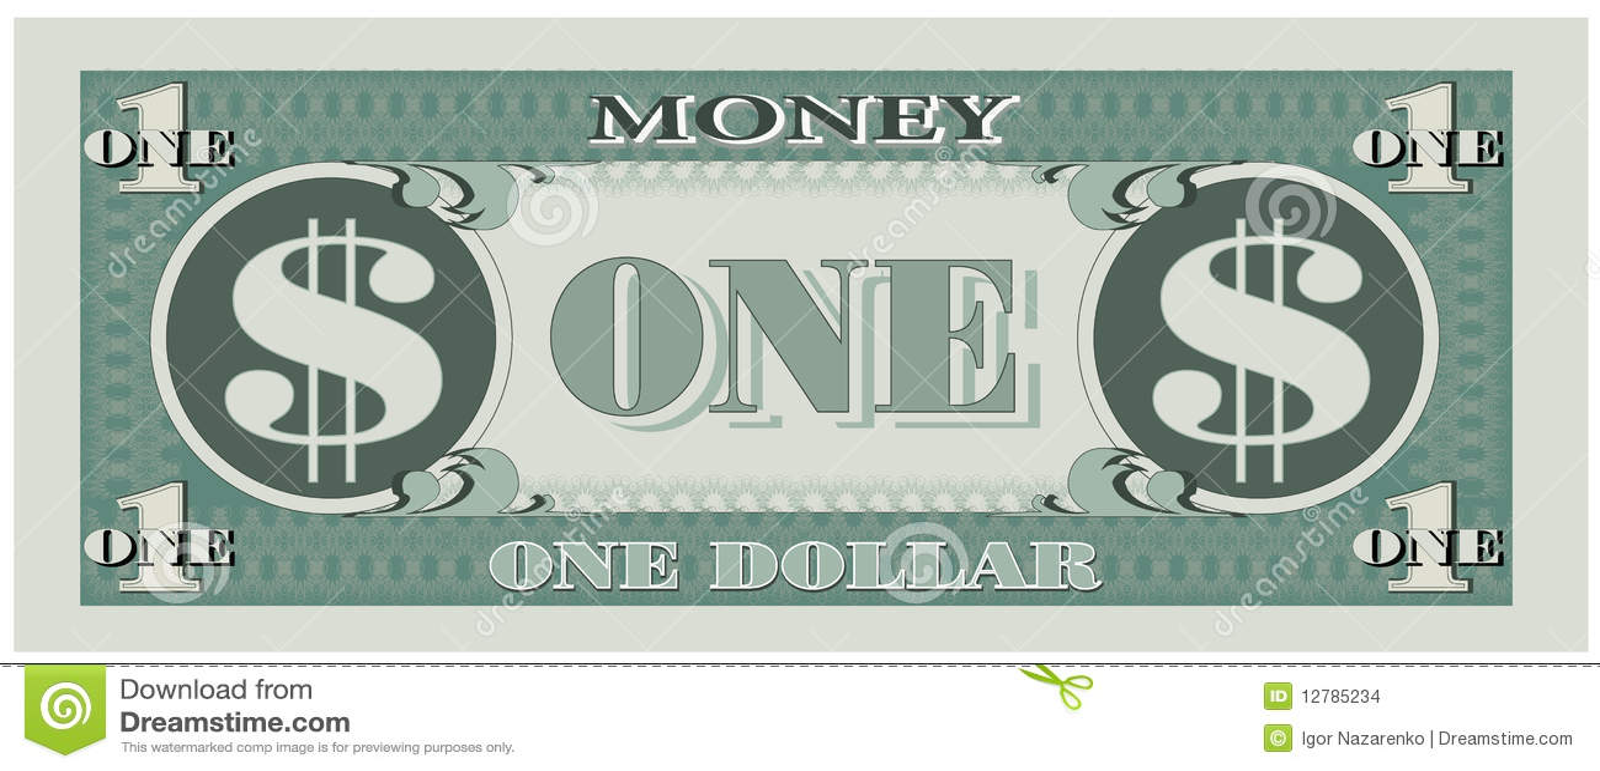 Game money - one dollar bill